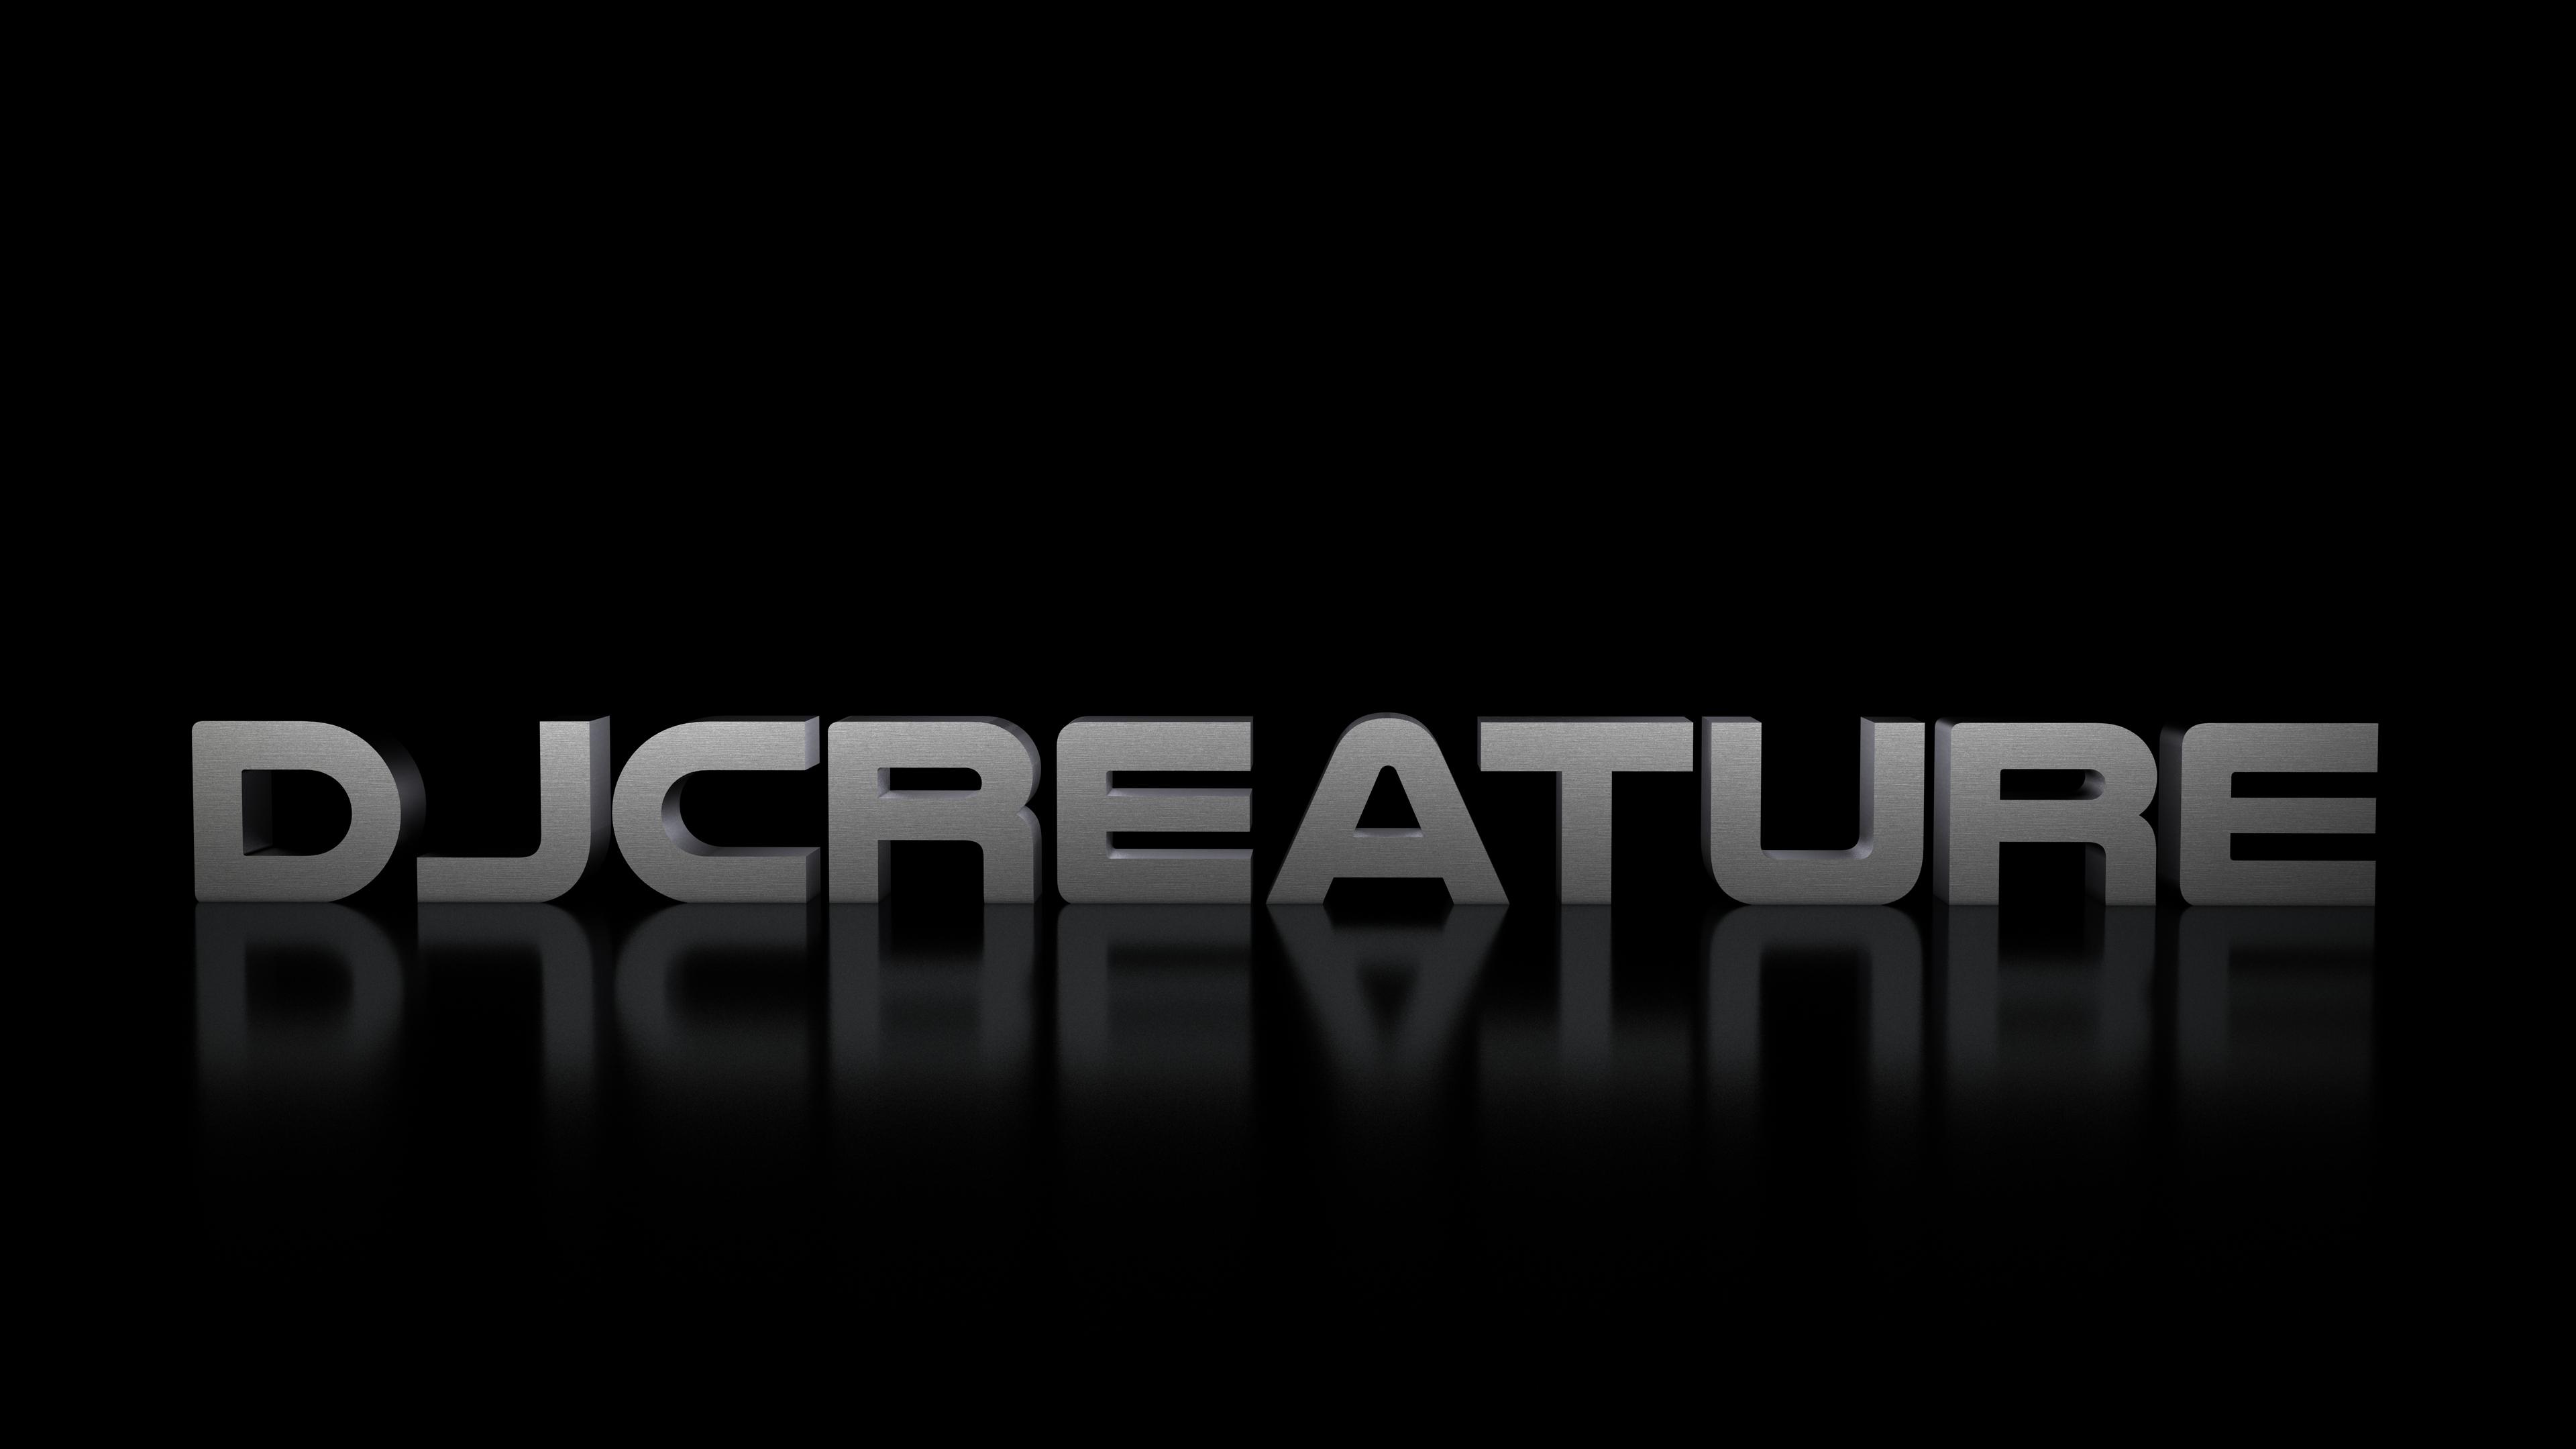 C4D 3D Text/Logo Studio Background Template (Download